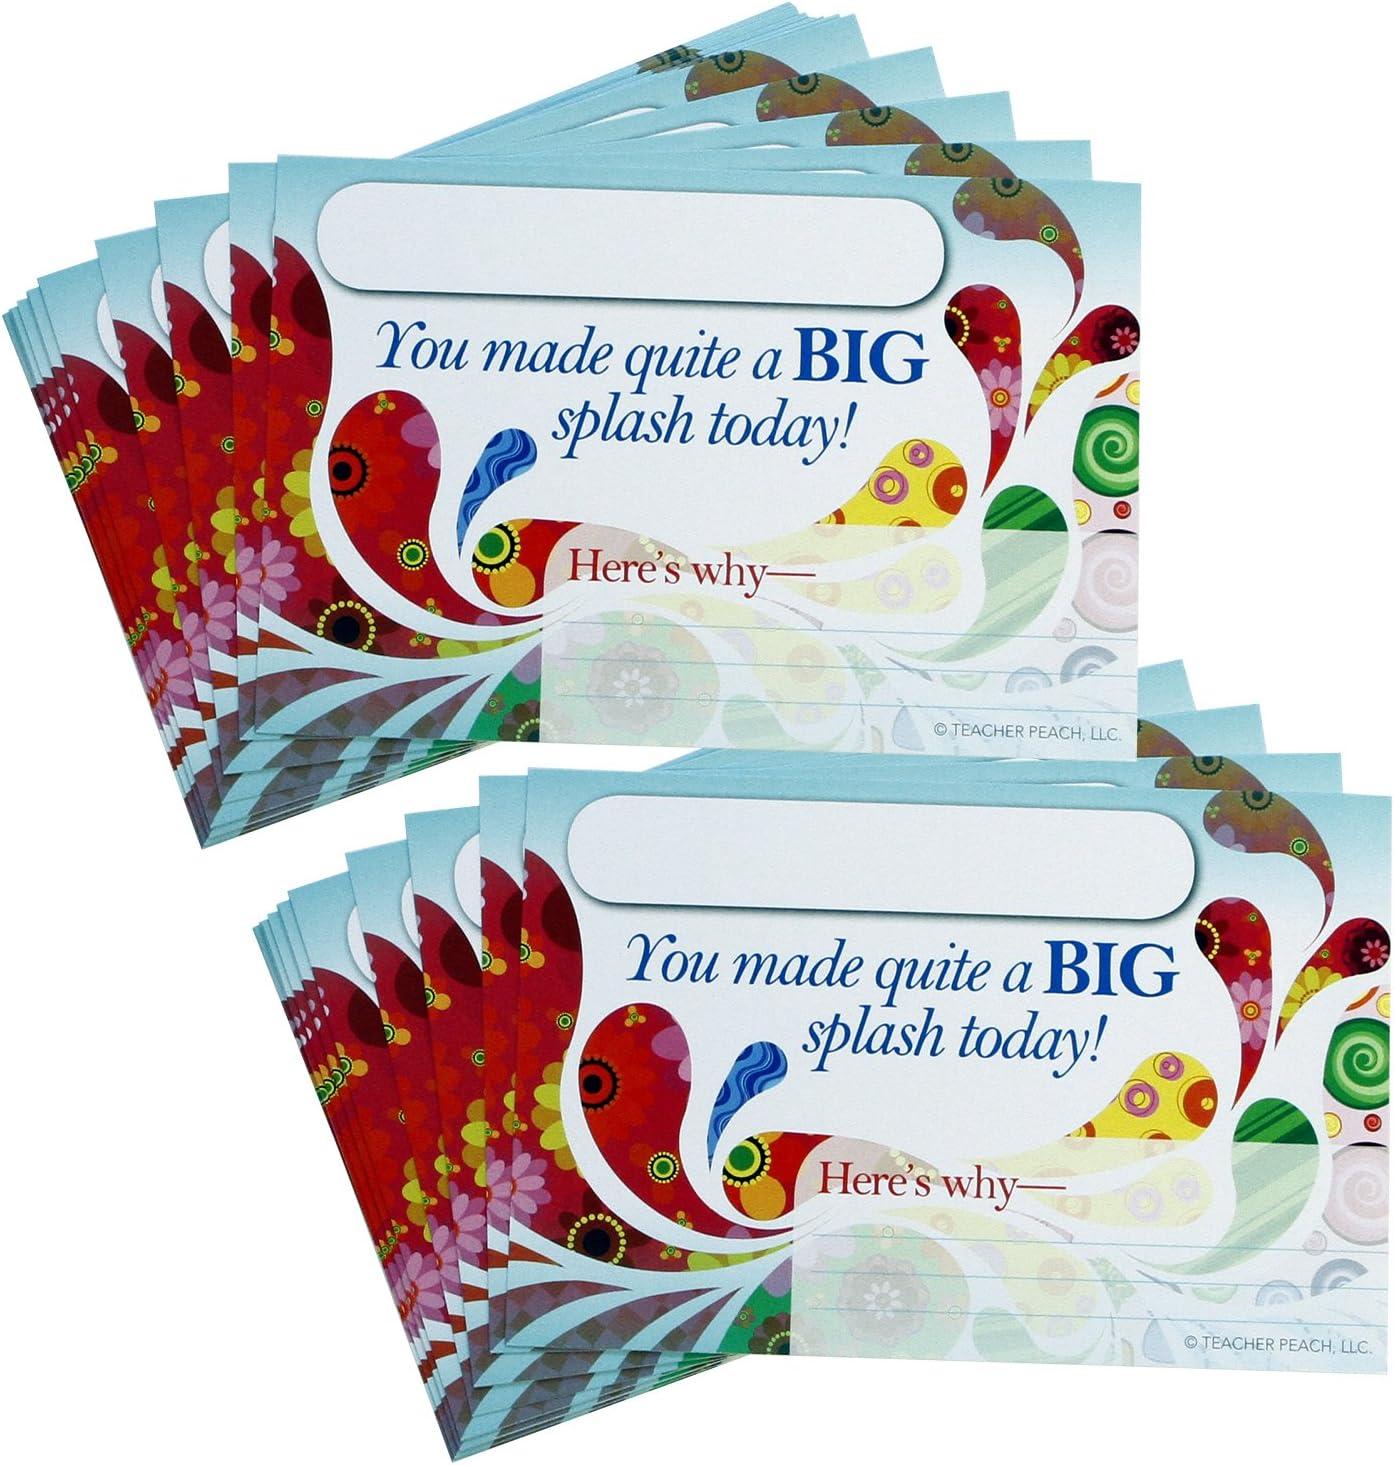 Positive Postcards from Teachers to Students, 50 Cards, Motivational Notes from Teachers, Classroom Teaching Supplies for Preschool, Kindergarten, and Elementary School Teachers (Big Splash)…